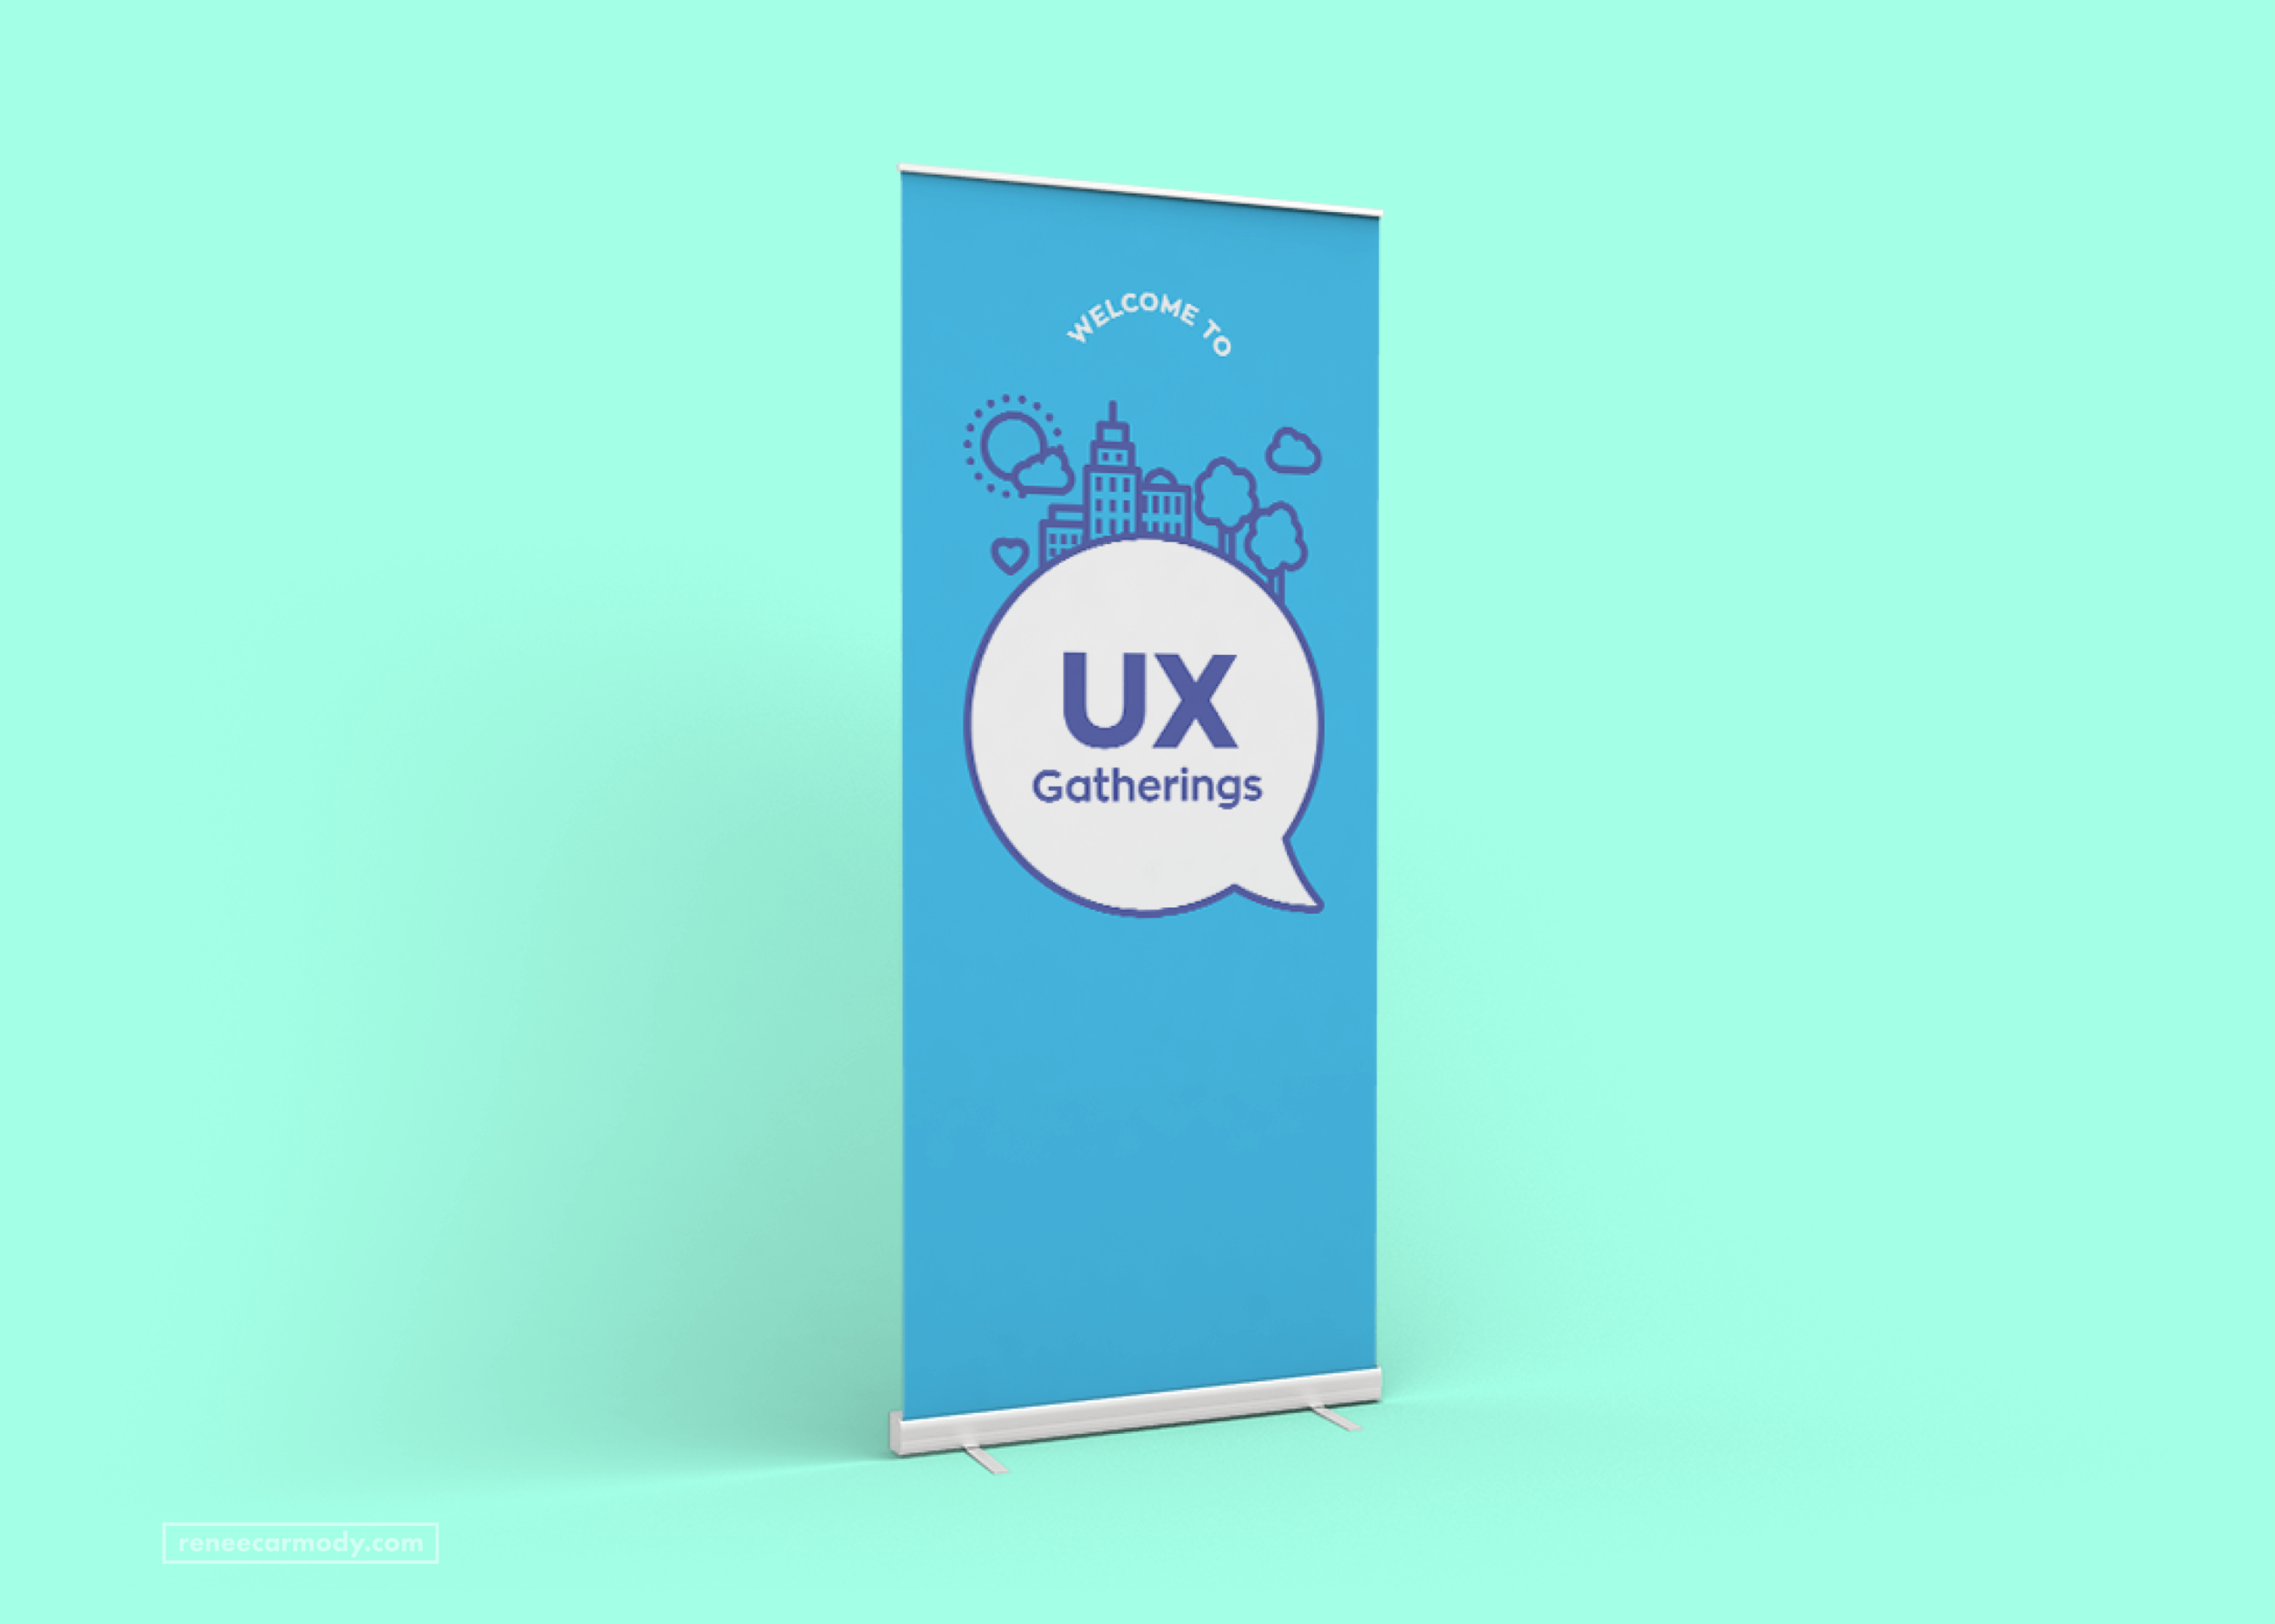 Event banner design by Renée Carmody Design for UX Gatherings